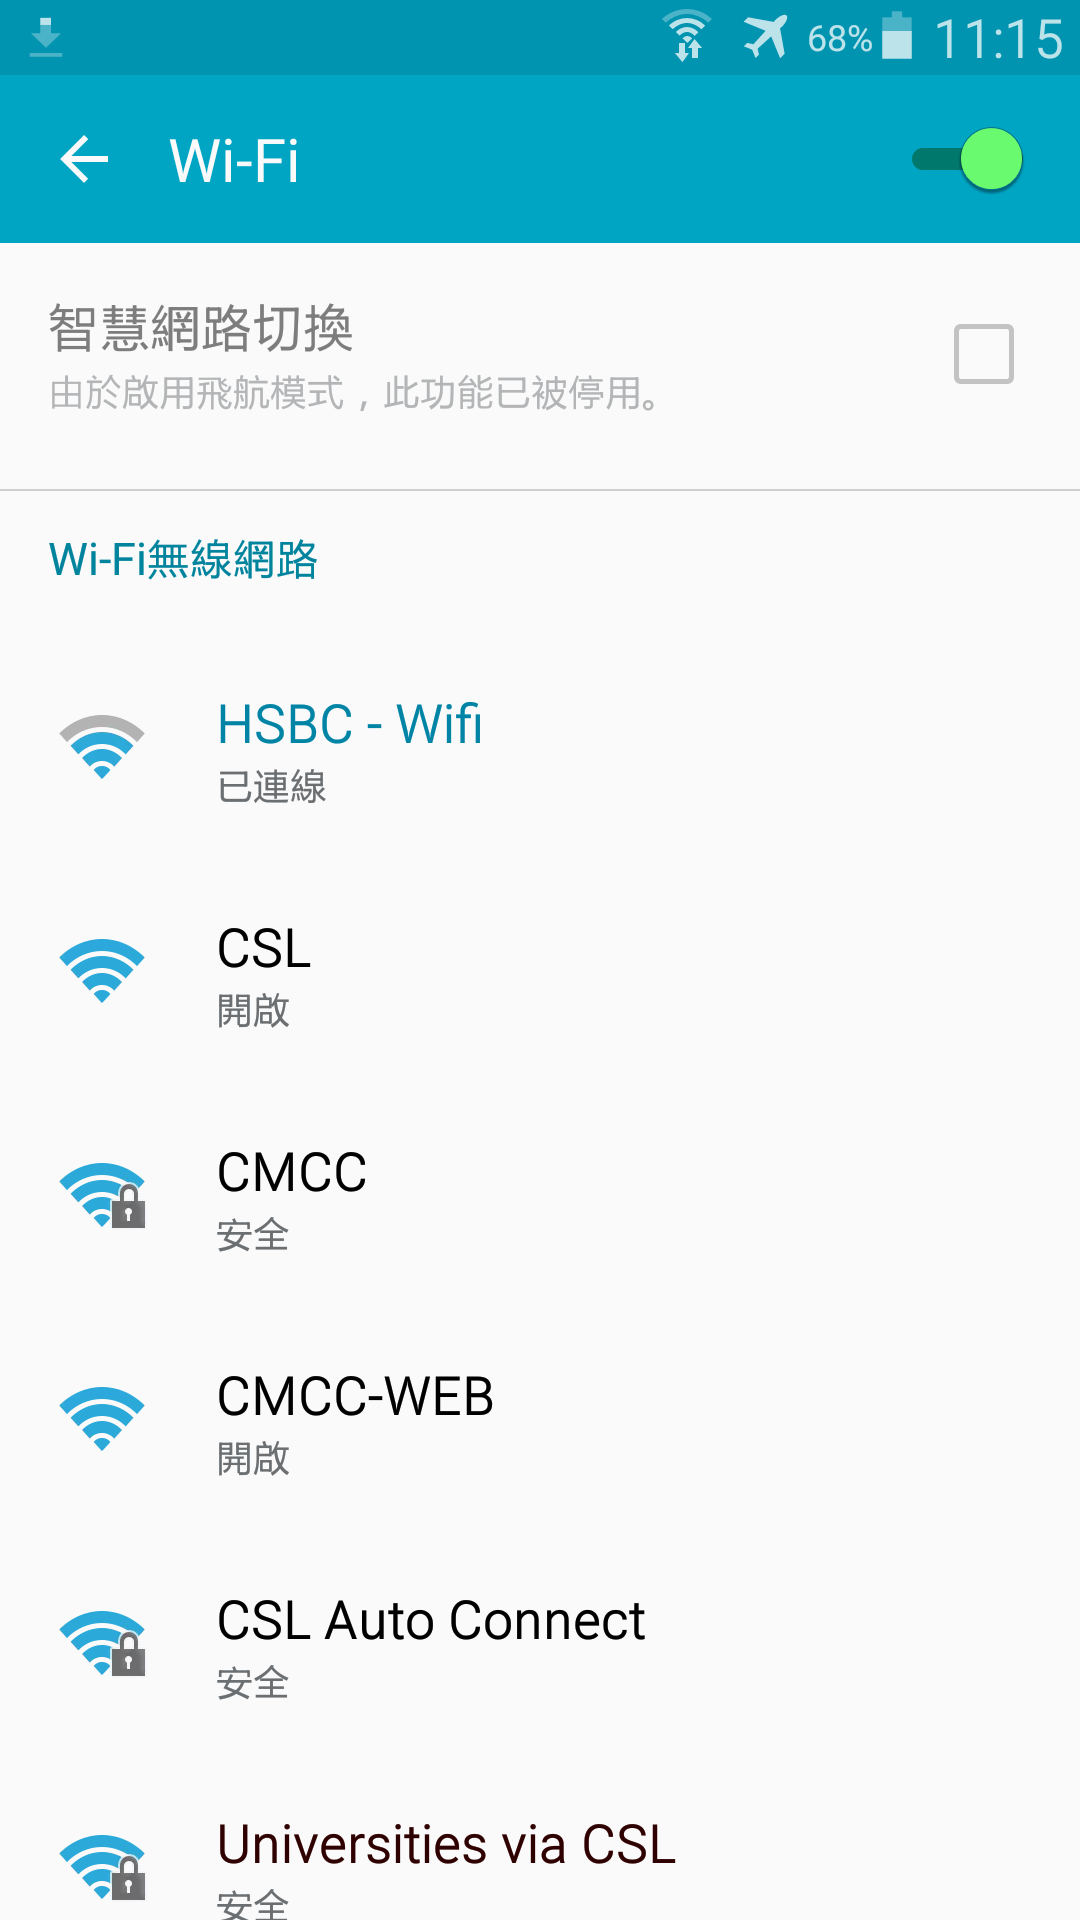 2016-02-06_HSBC 匯豐銀行 04.png